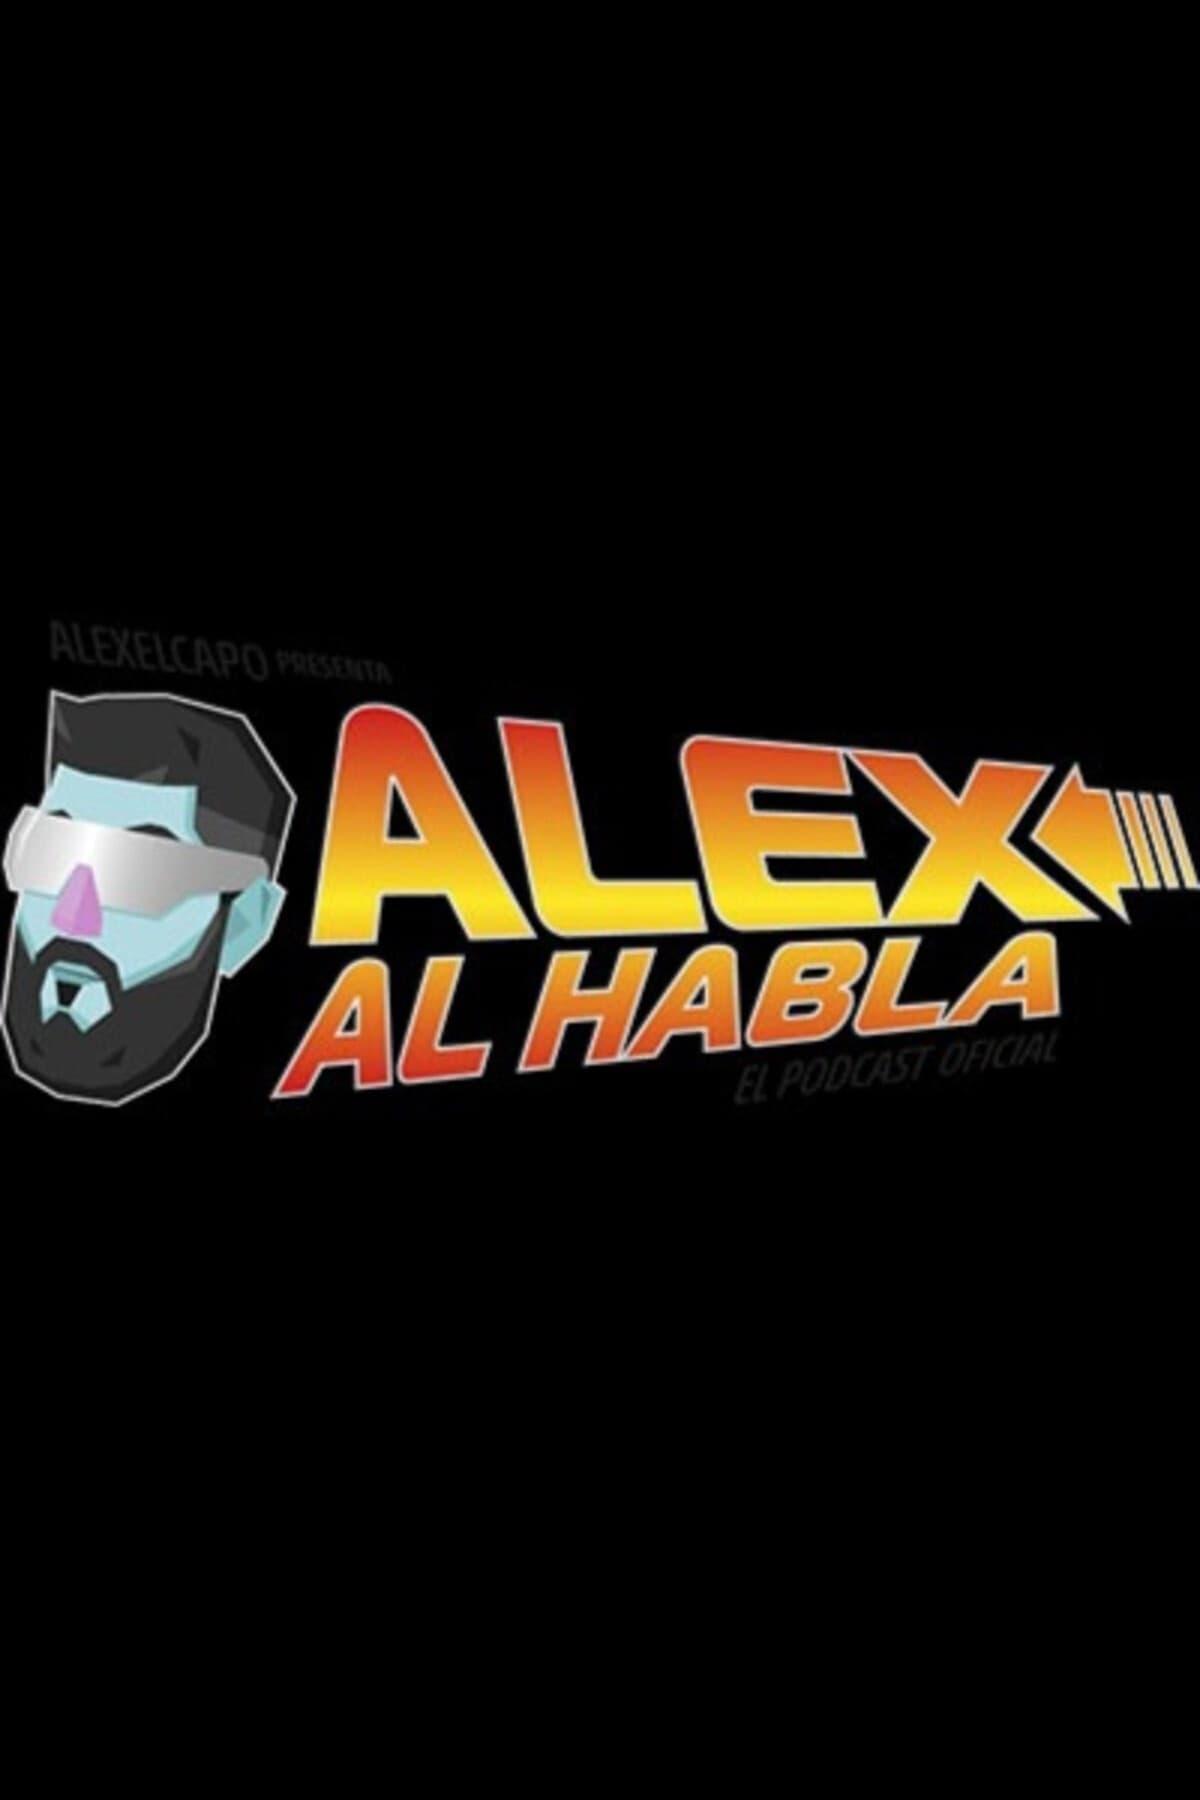 ALEX AL HABLA TV Shows About Witch